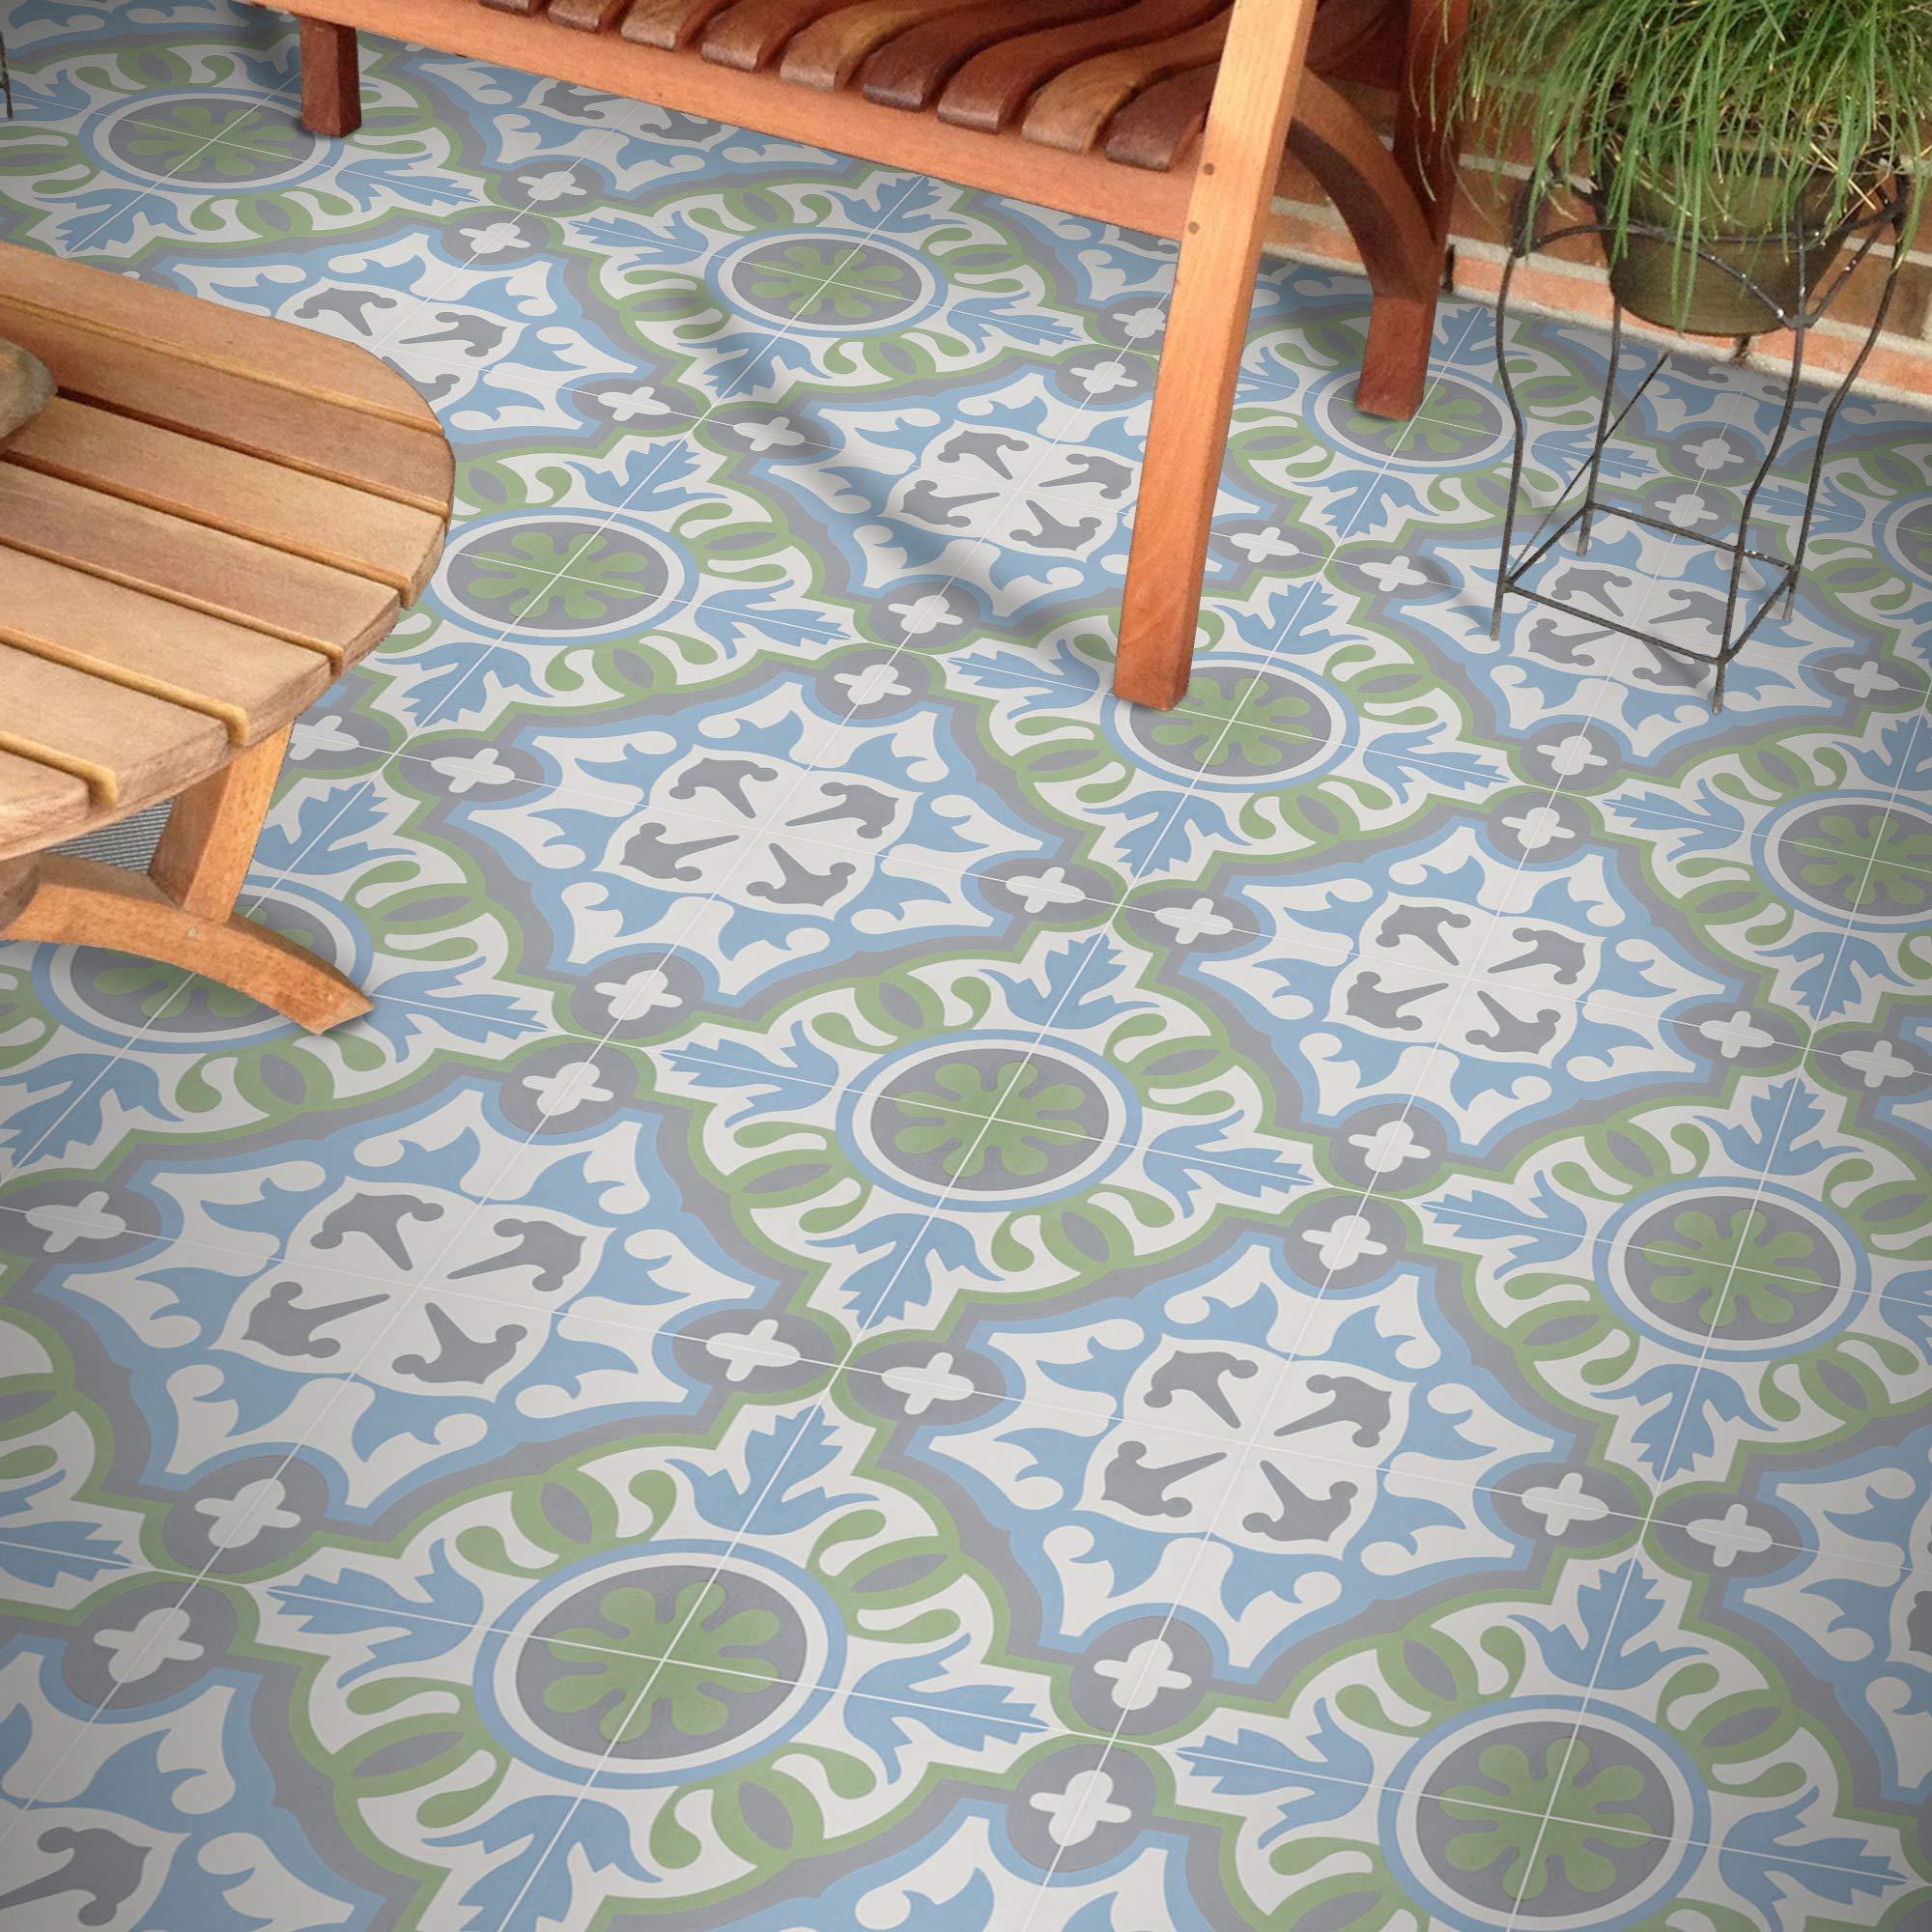 "Moroccan Mosaic & Tile House CTP05-08 BAHA Handmade Cement Tile 8""x8"" Blue, Green, Grey"